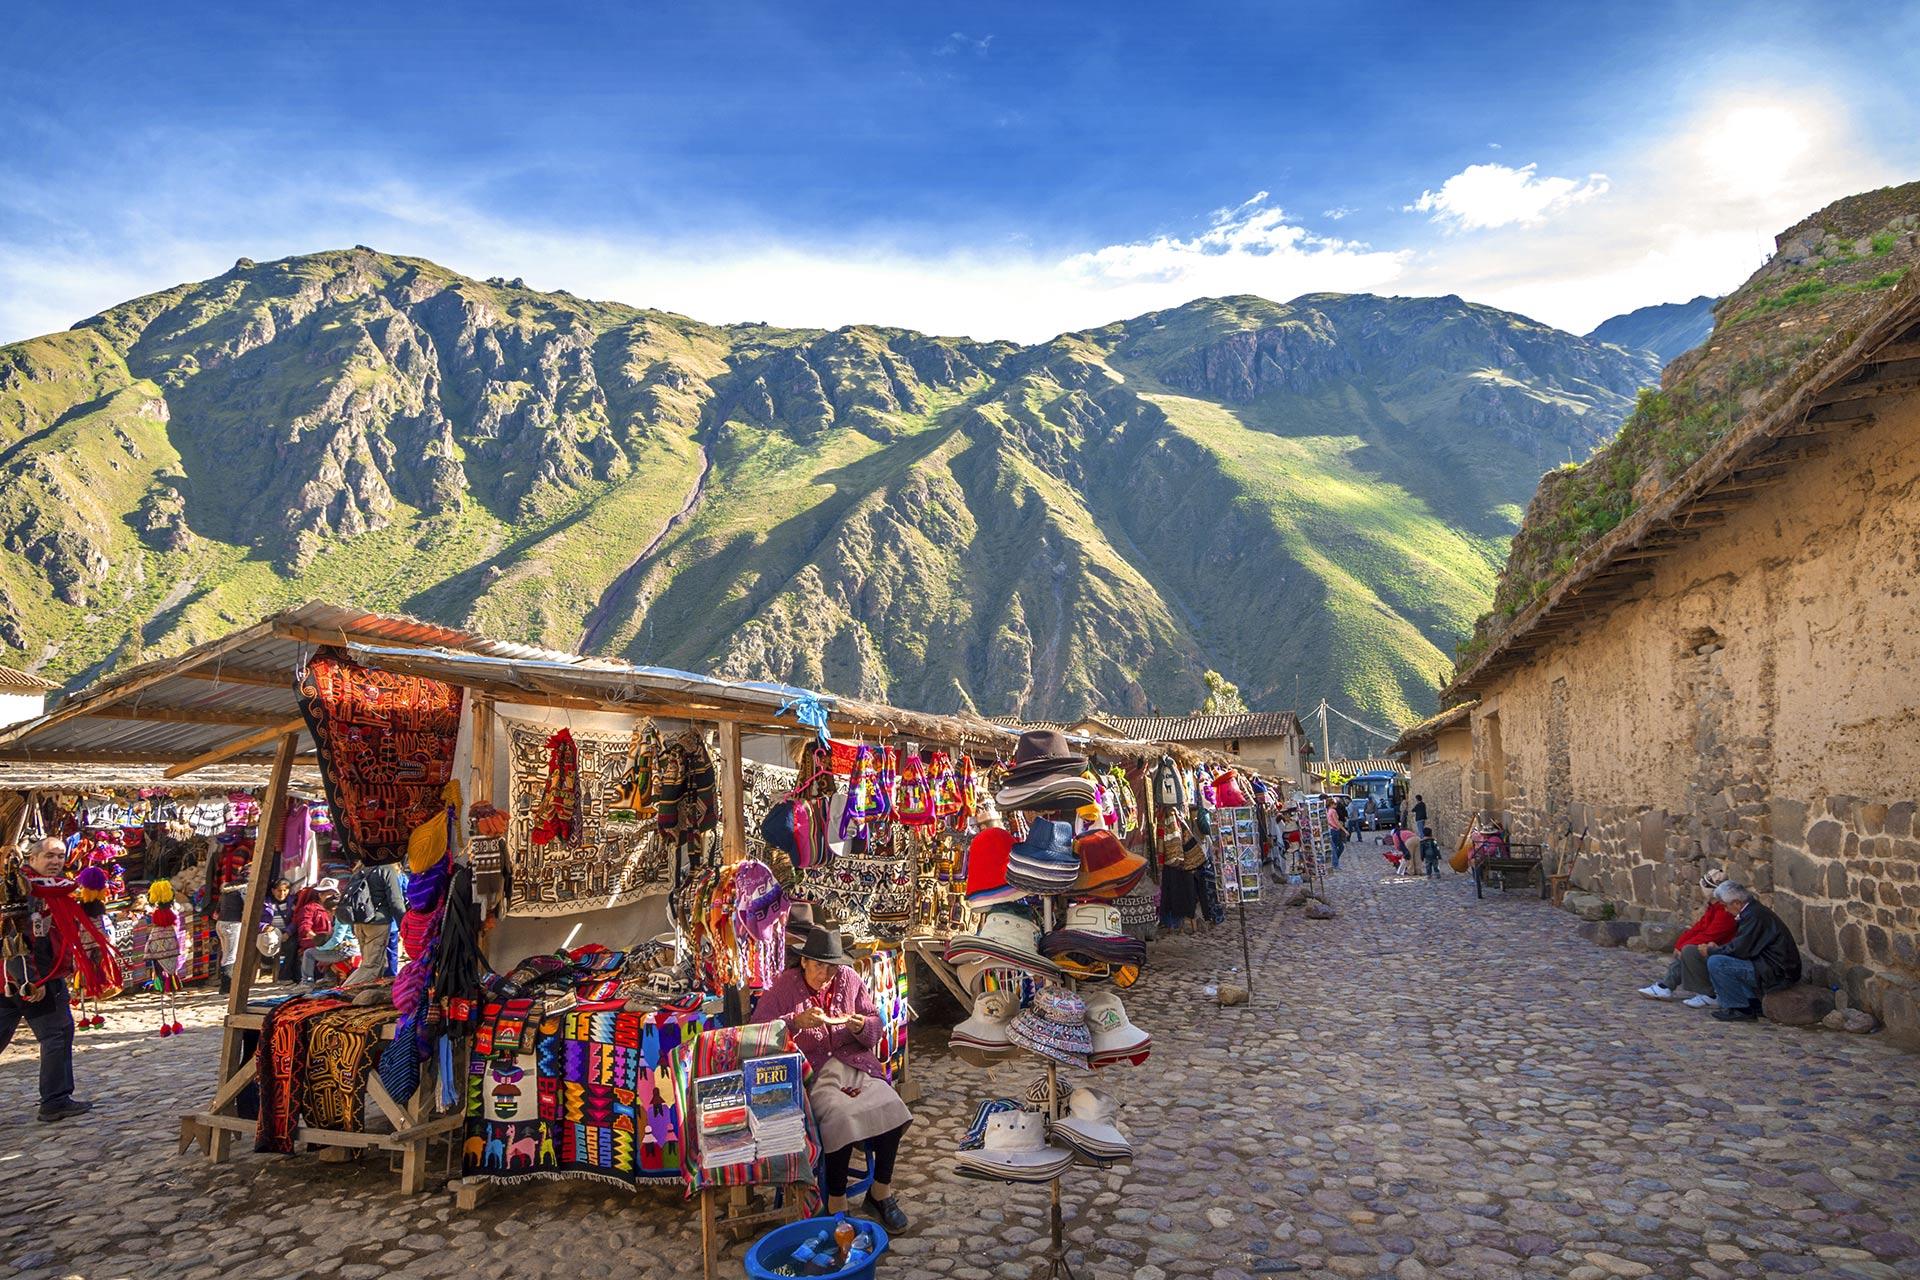 Ollantaytambo, Peru; Photo Courtesy of klublu/Shutterstock.com